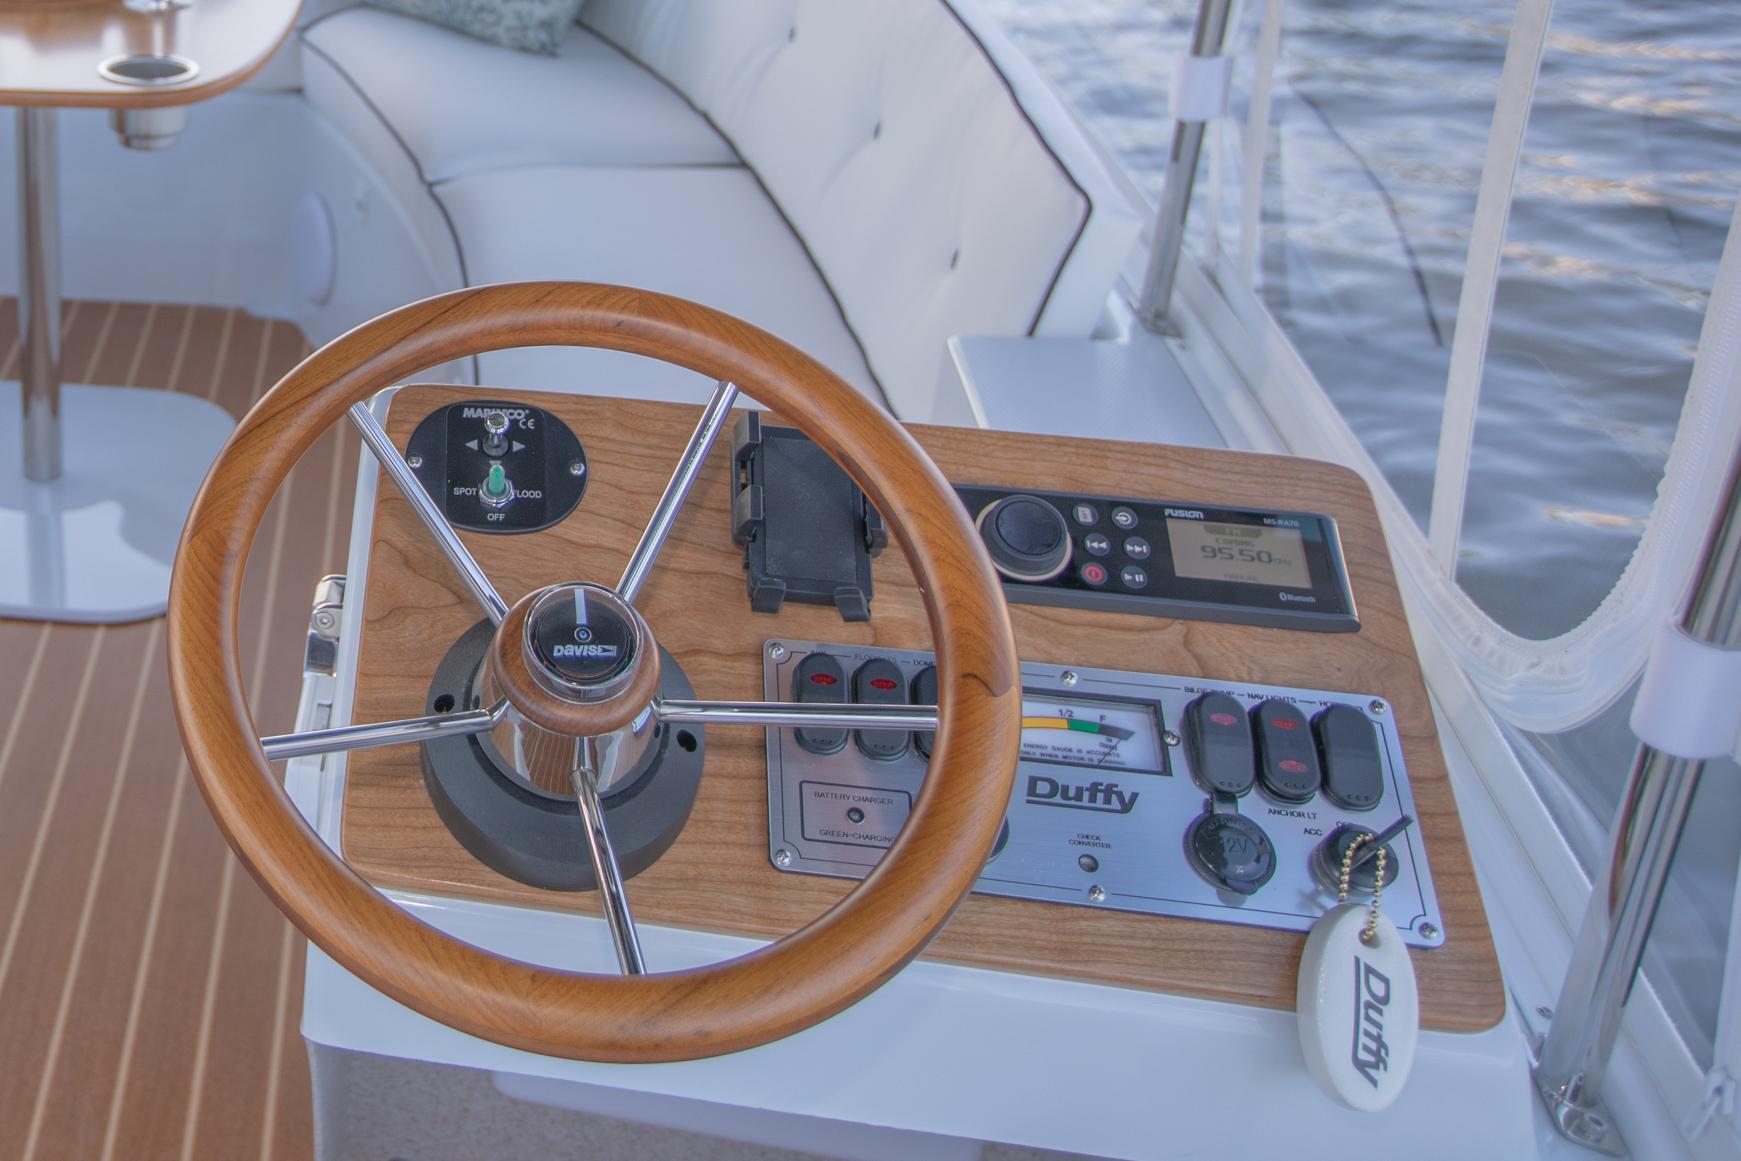 Duffy-Electric-Boats-18-Snug-Harbor-Interior-2020-10